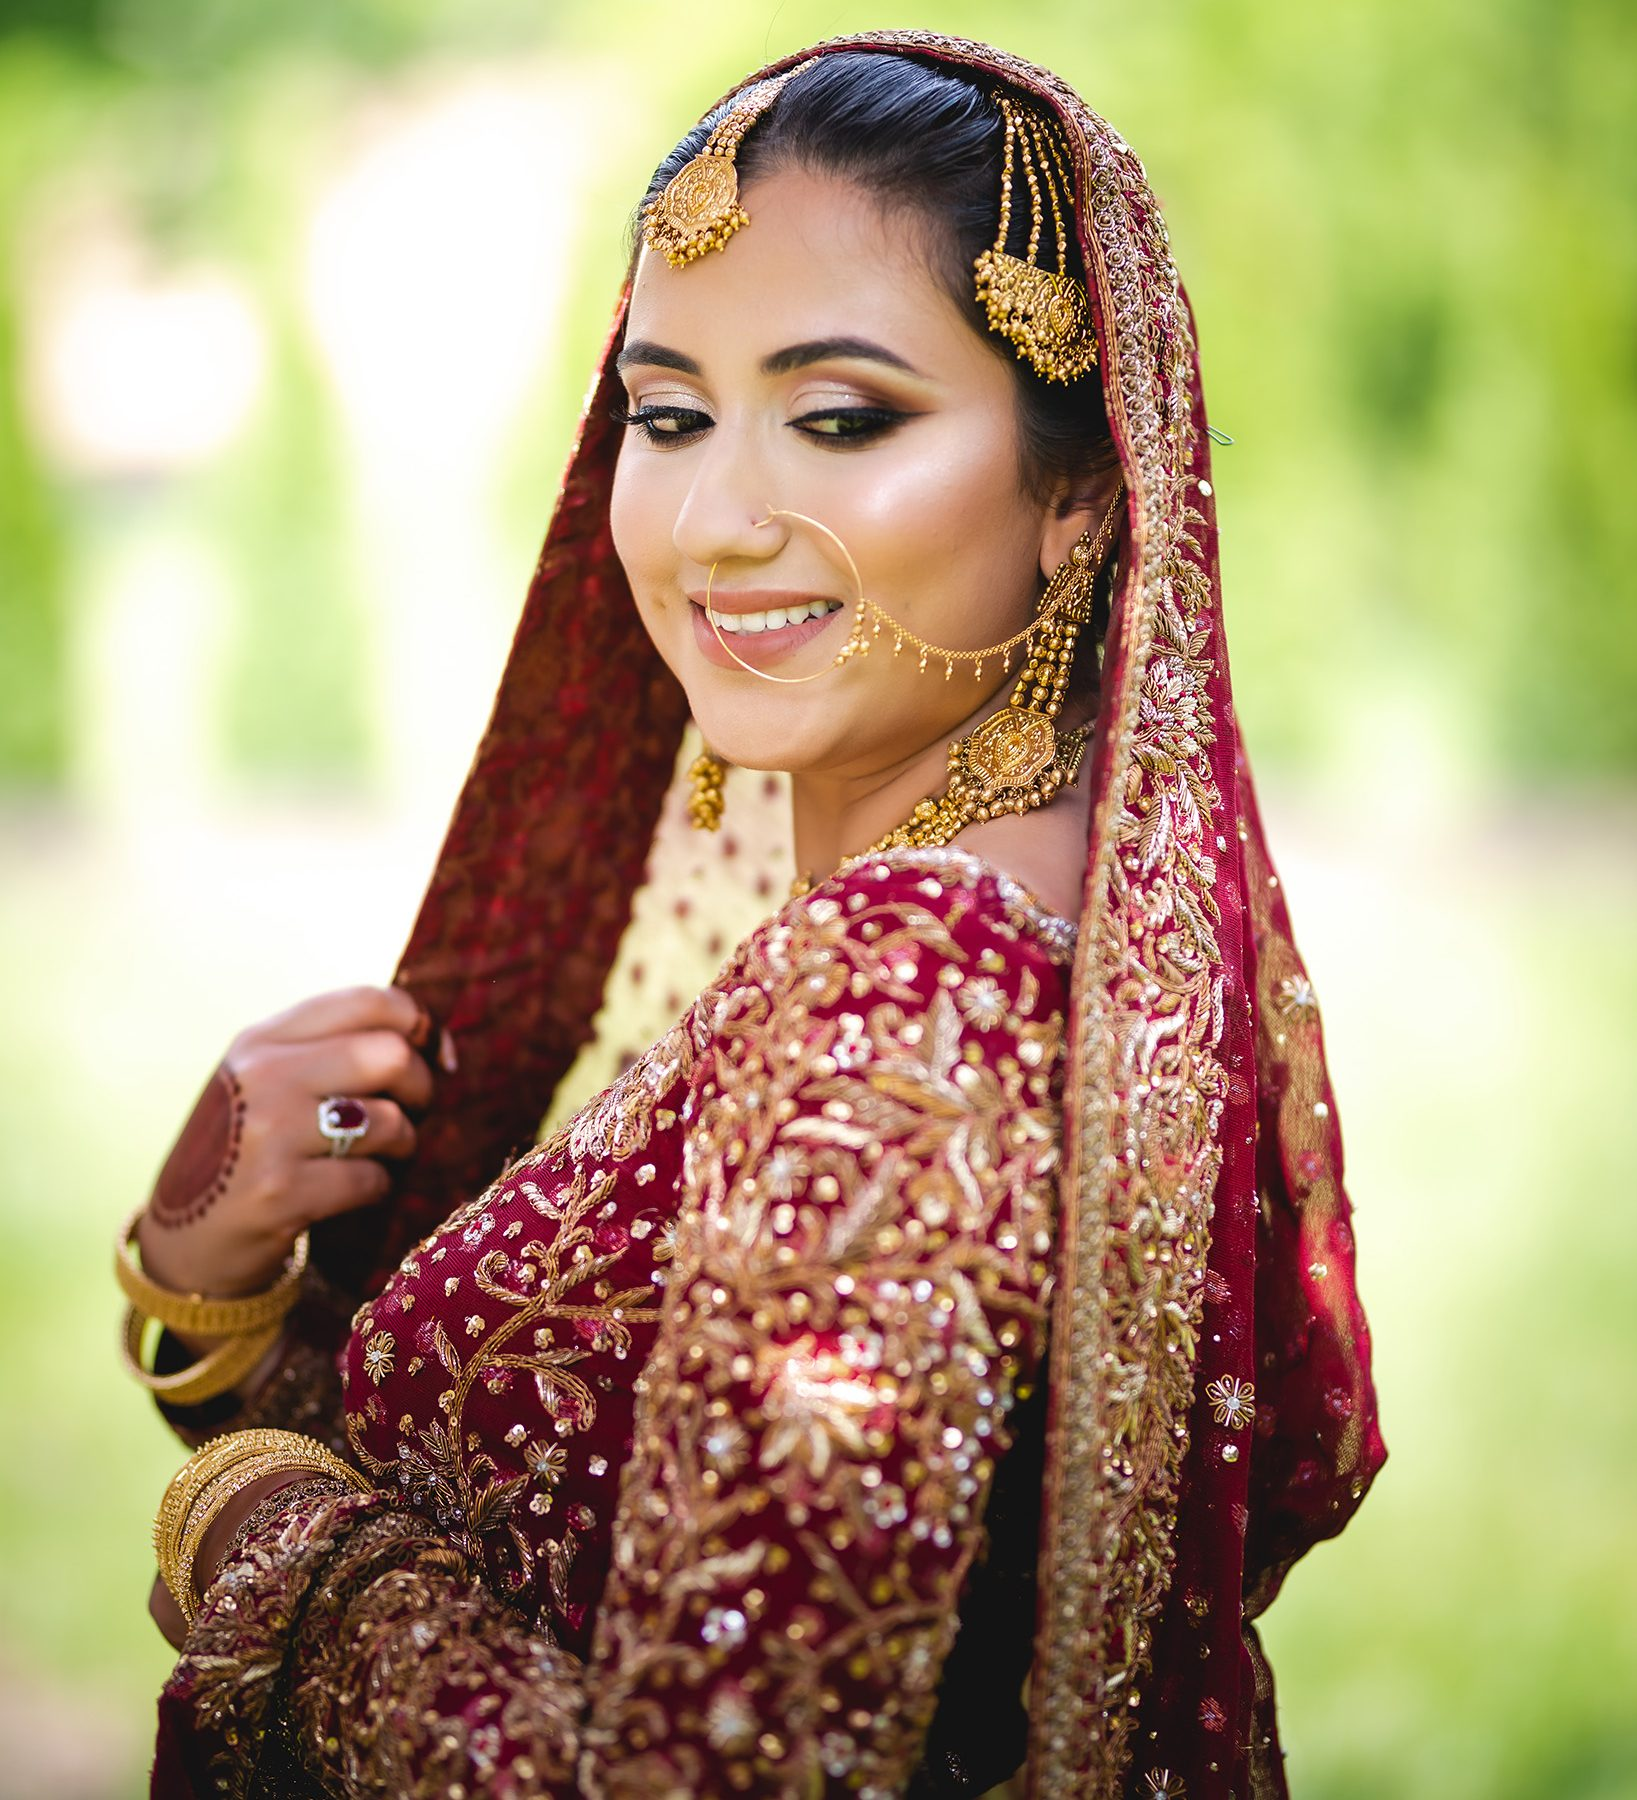 Staten-Island-Wedding-Photography-1637x1800 SOUTH ASIAN WEDDINGS